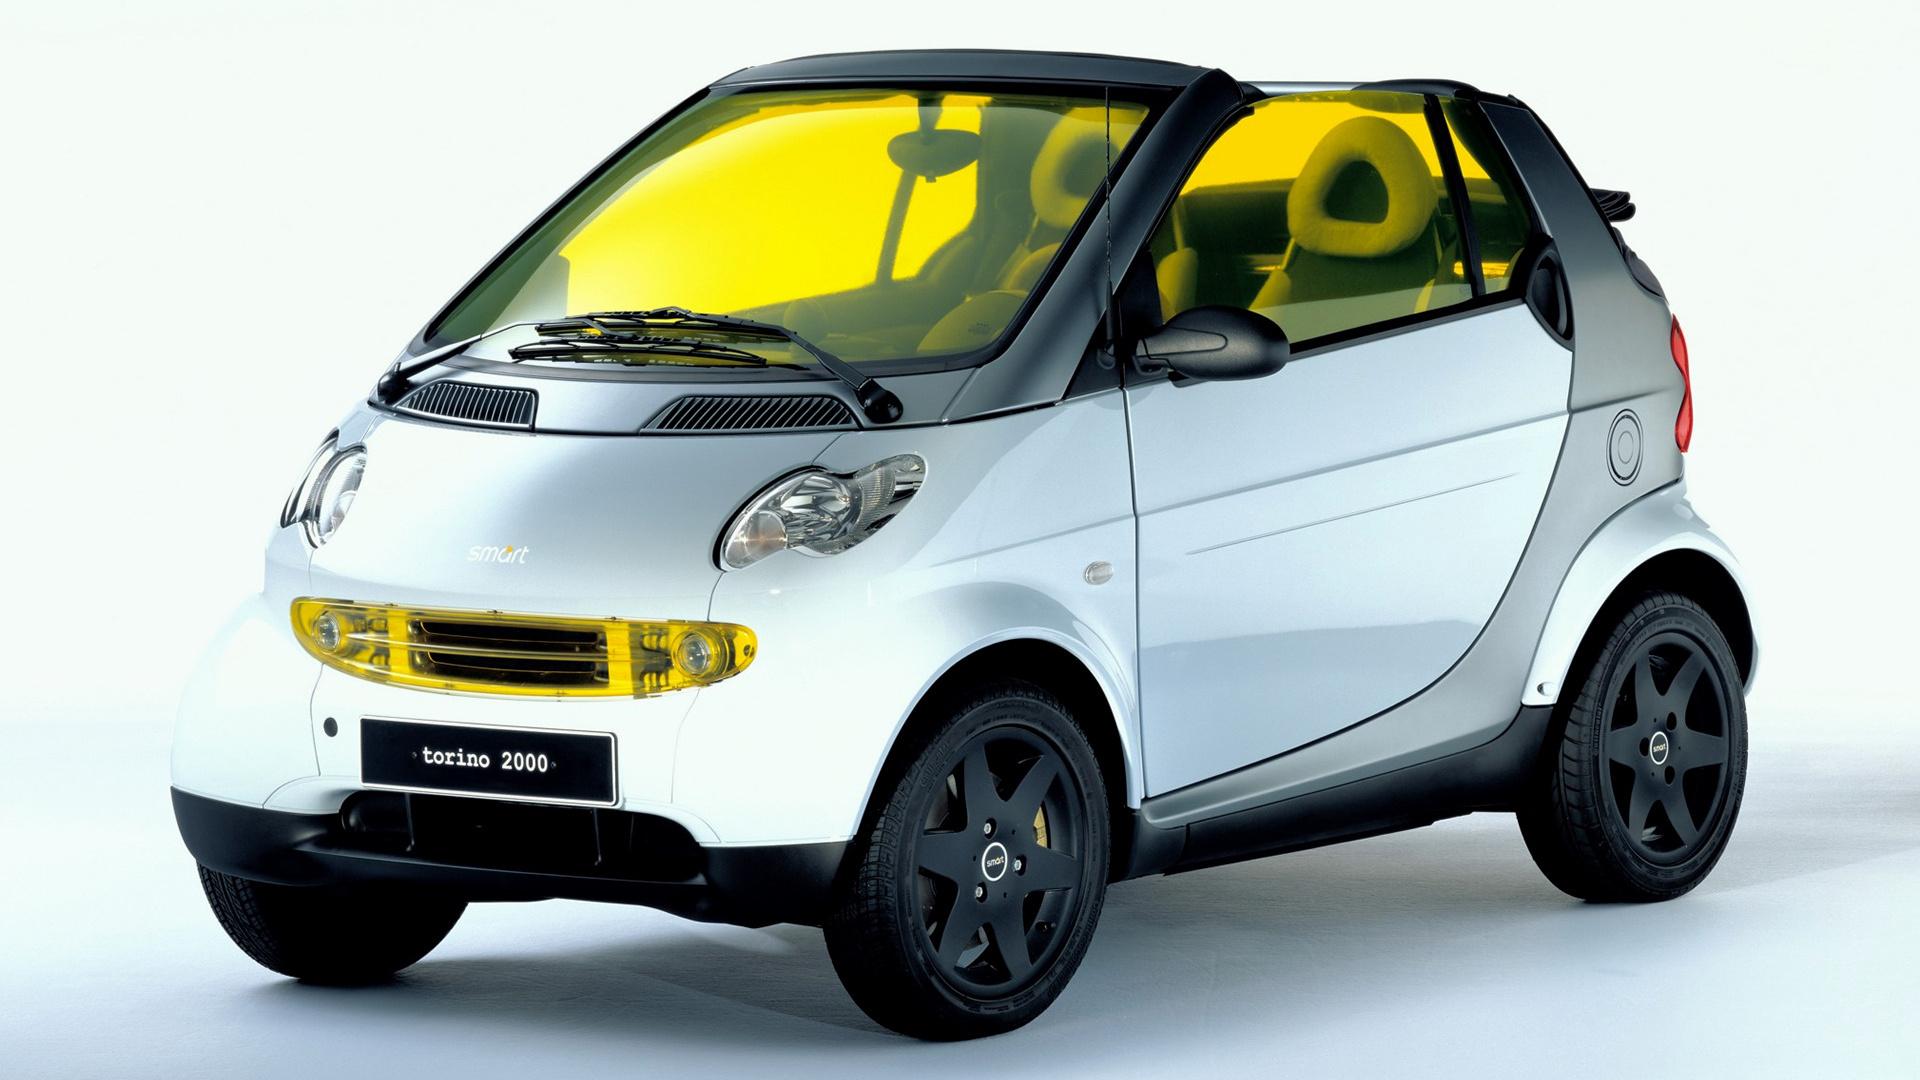 smart torino 2000 concept 2000 wallpapers and hd images car pixel. Black Bedroom Furniture Sets. Home Design Ideas